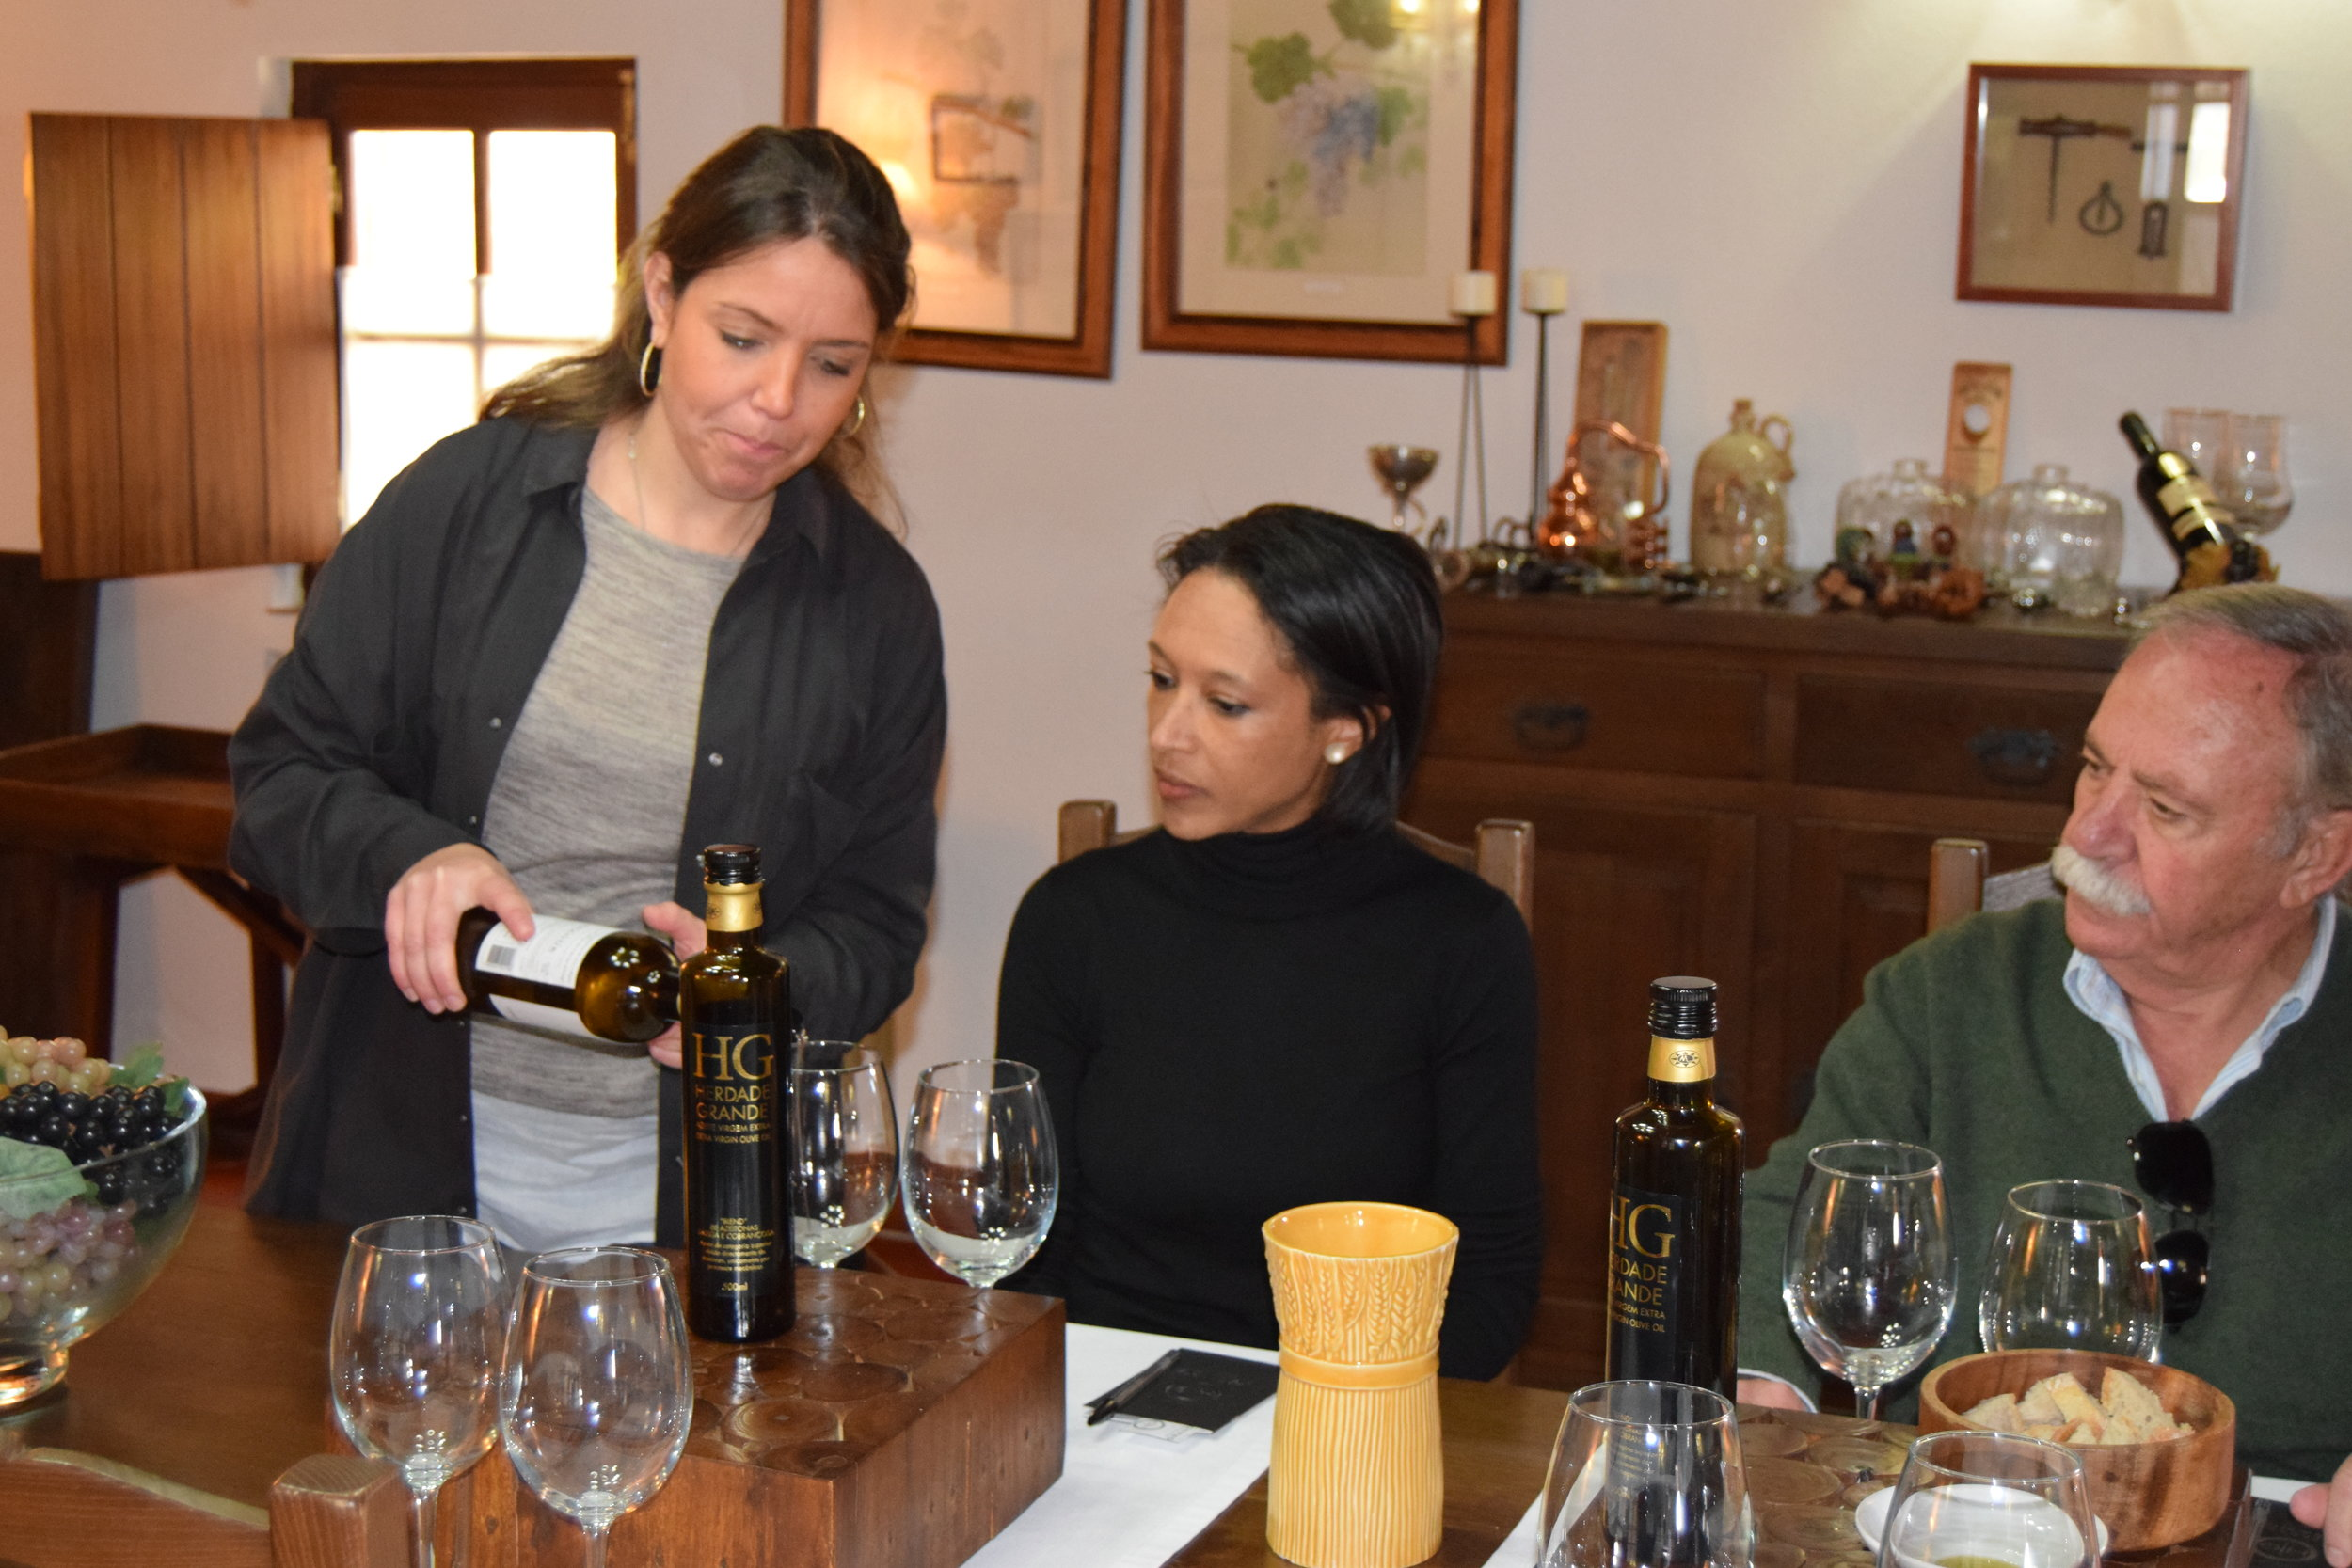 Winemakers MARIANA LAN  ÇA & FATHER, ANTONIO MANUEL LAN  ÇA OF HERDADE GRANDE